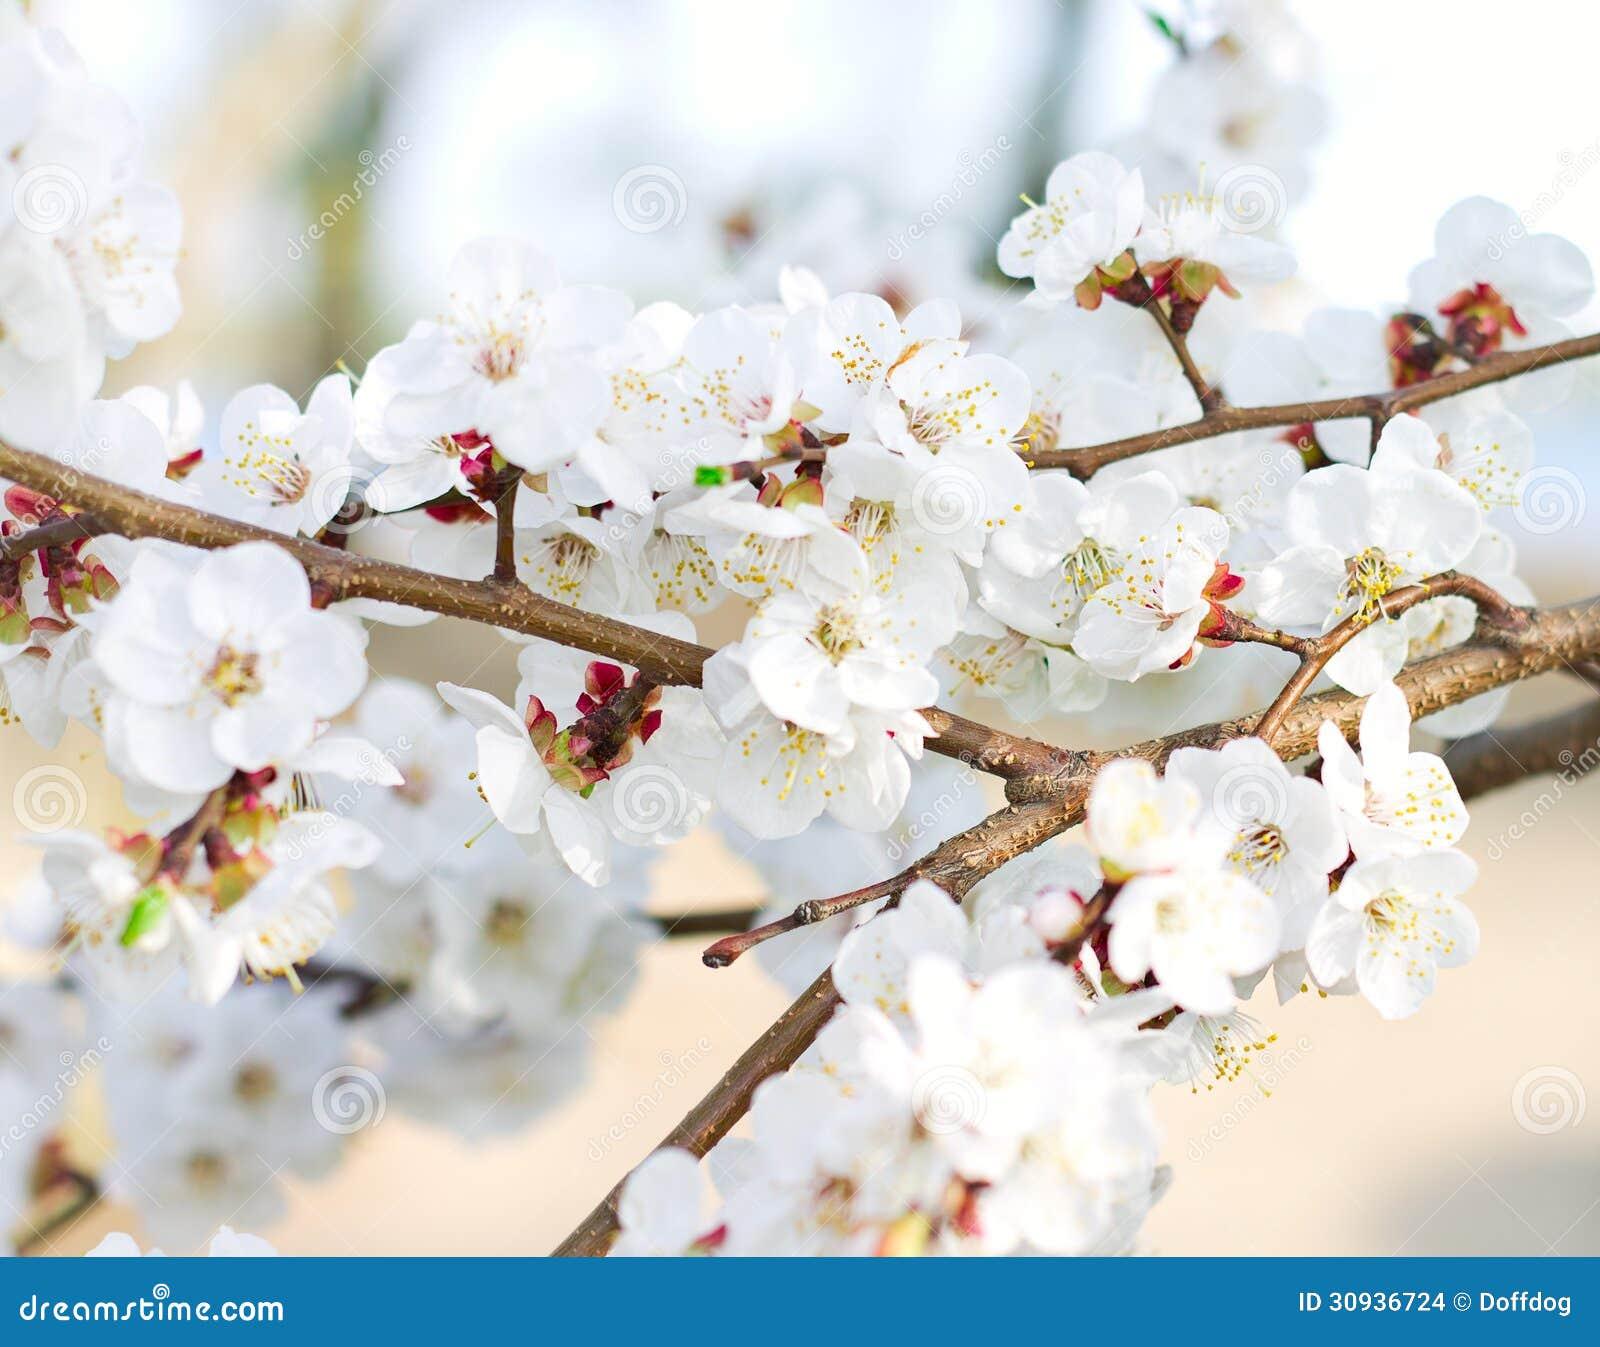 branche d 39 arbre en fleur photo stock image du agriculture 30936724. Black Bedroom Furniture Sets. Home Design Ideas